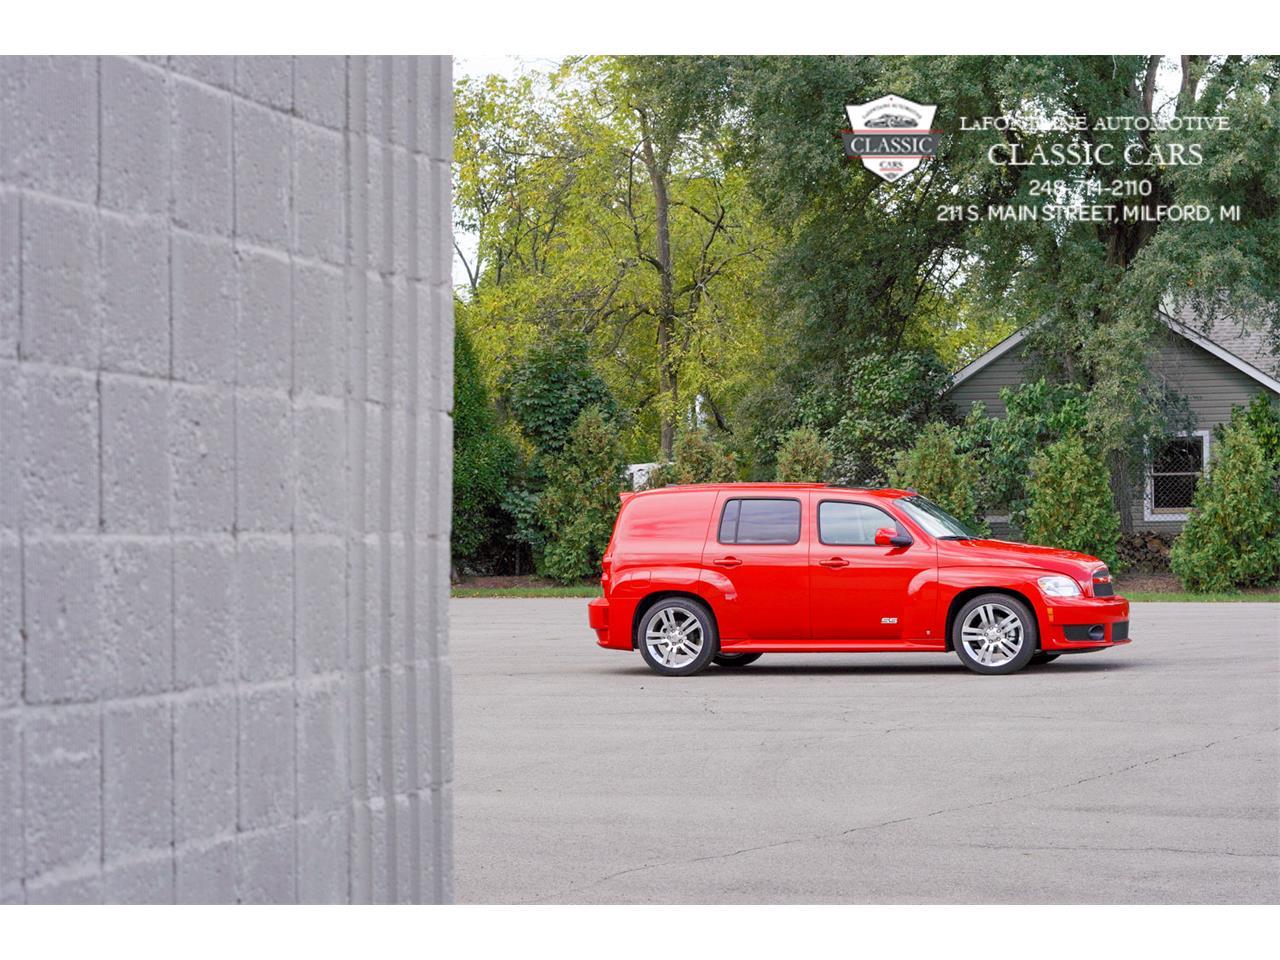 2009 Chevrolet HHR (CC-1410010) for sale in Milford, Michigan